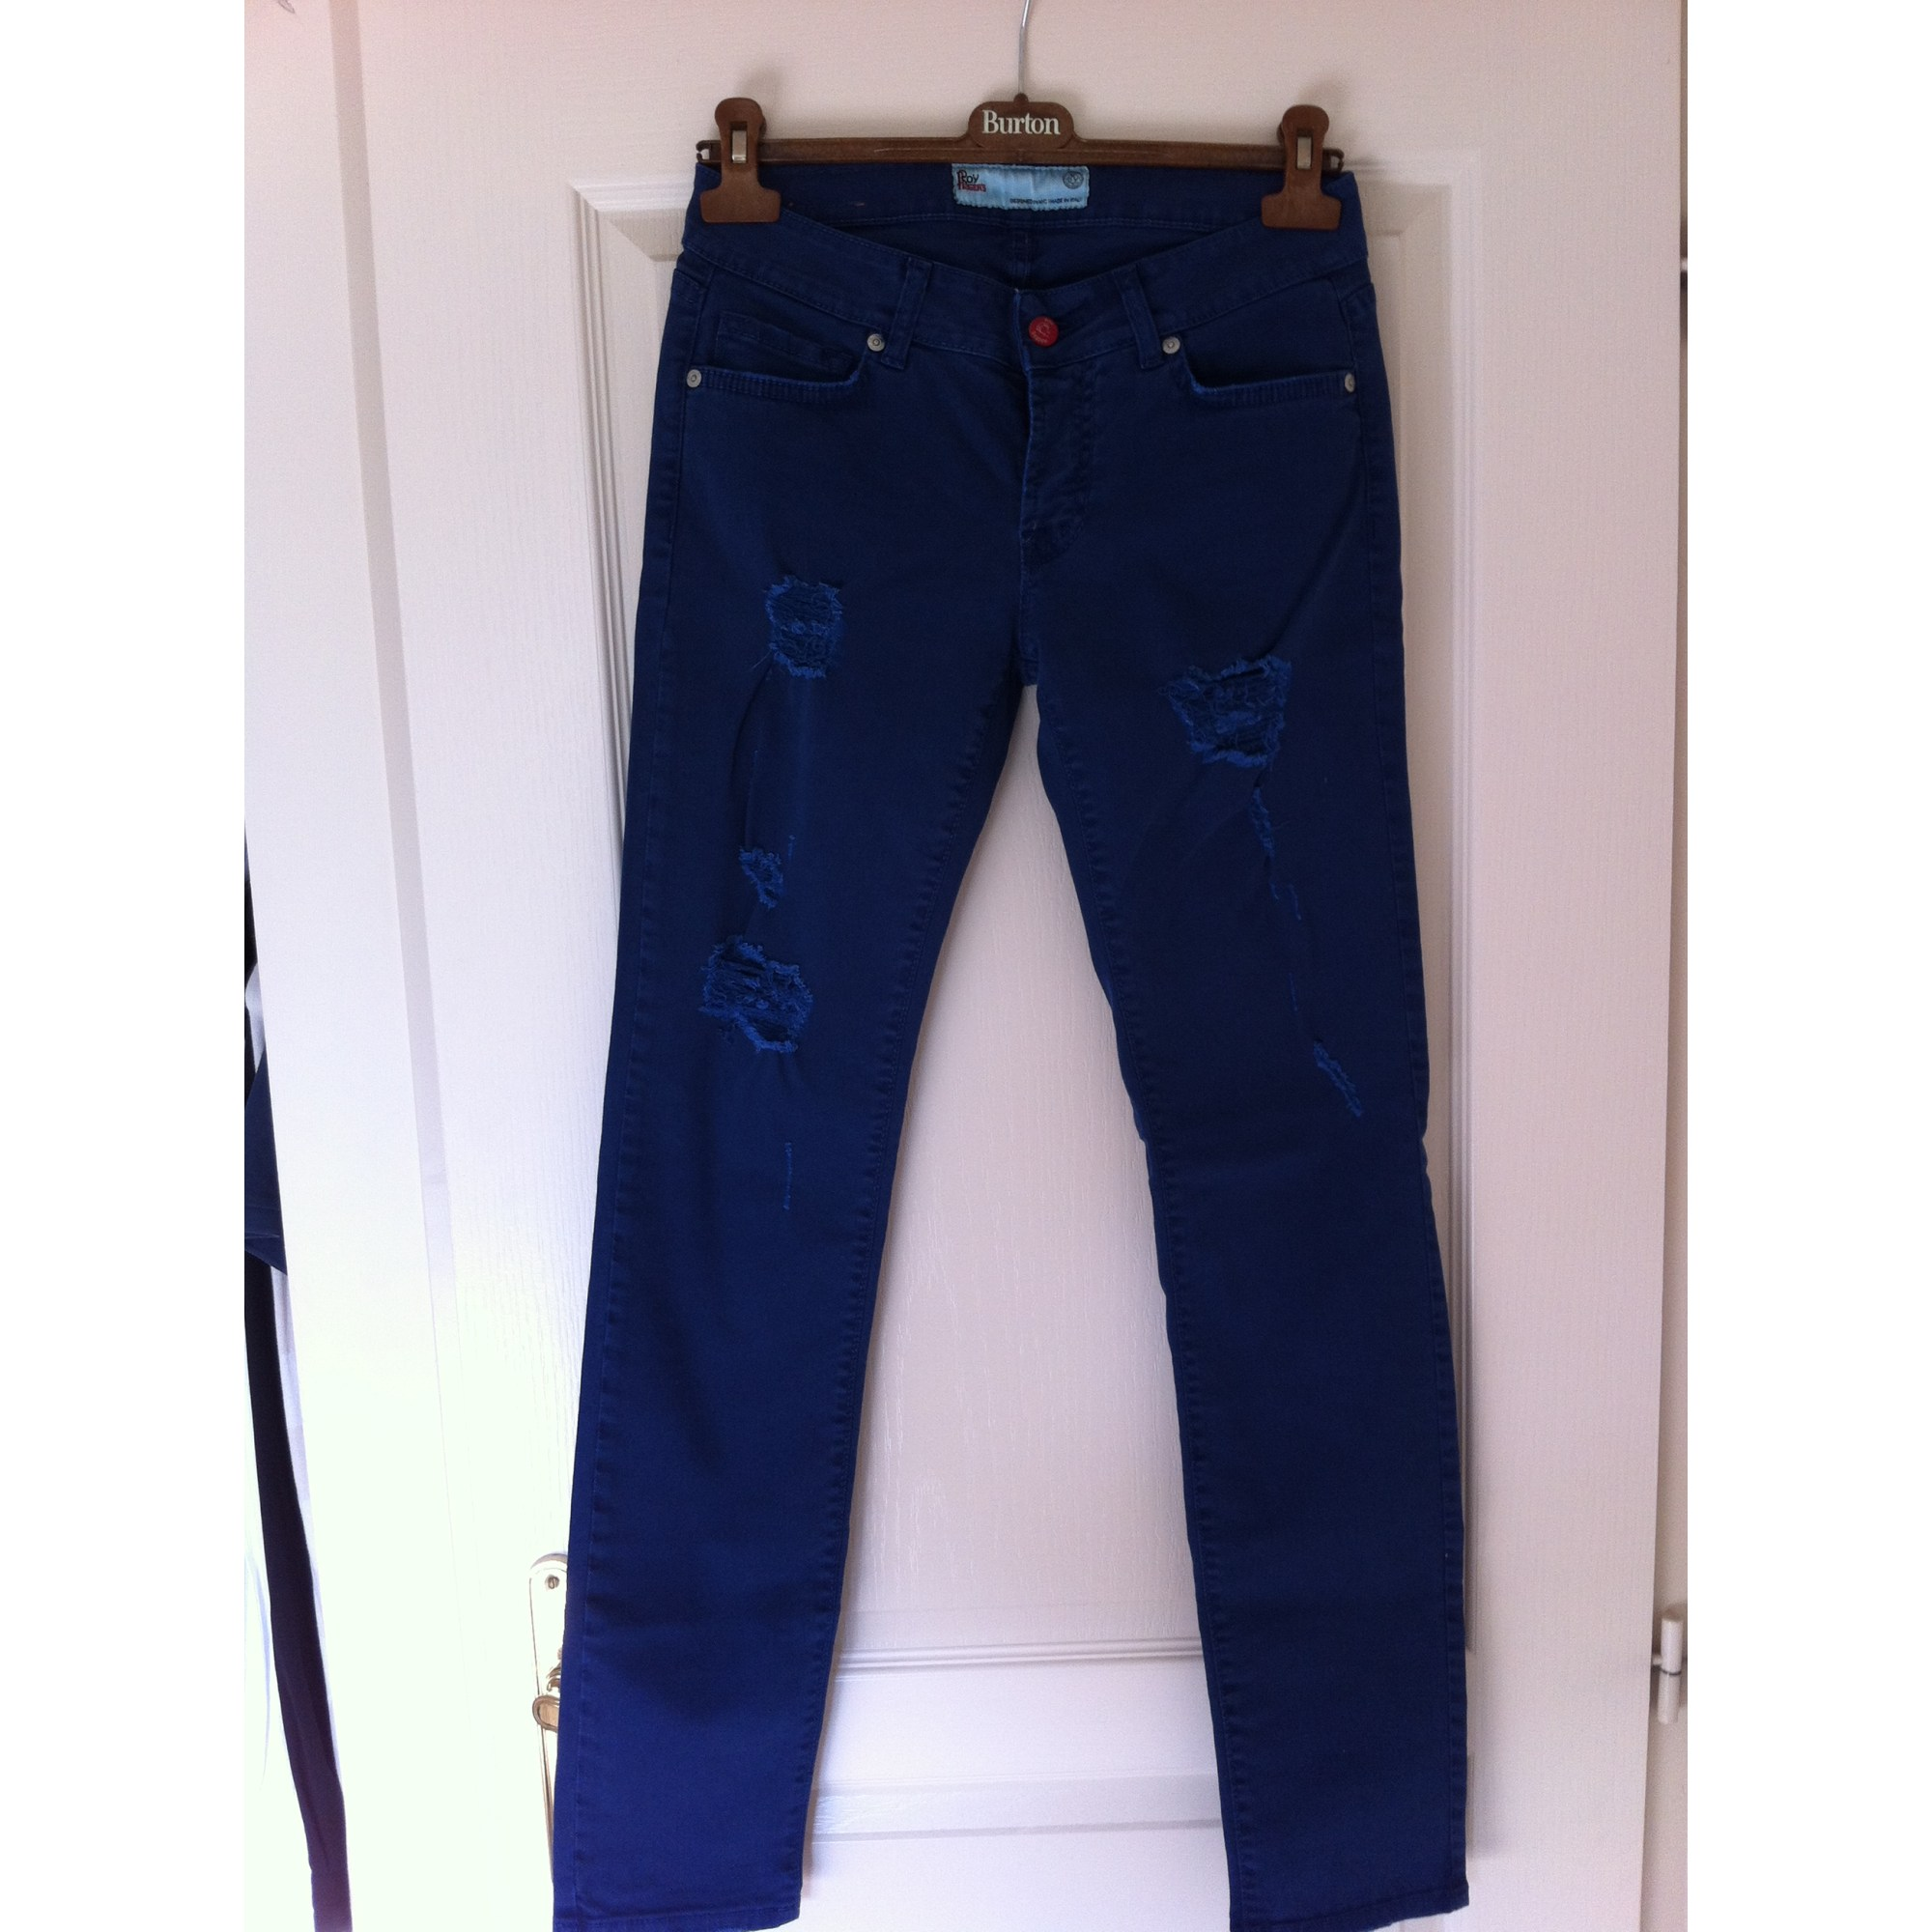 Jeans droit ROY ROGERS Bleu, bleu marine, bleu turquoise